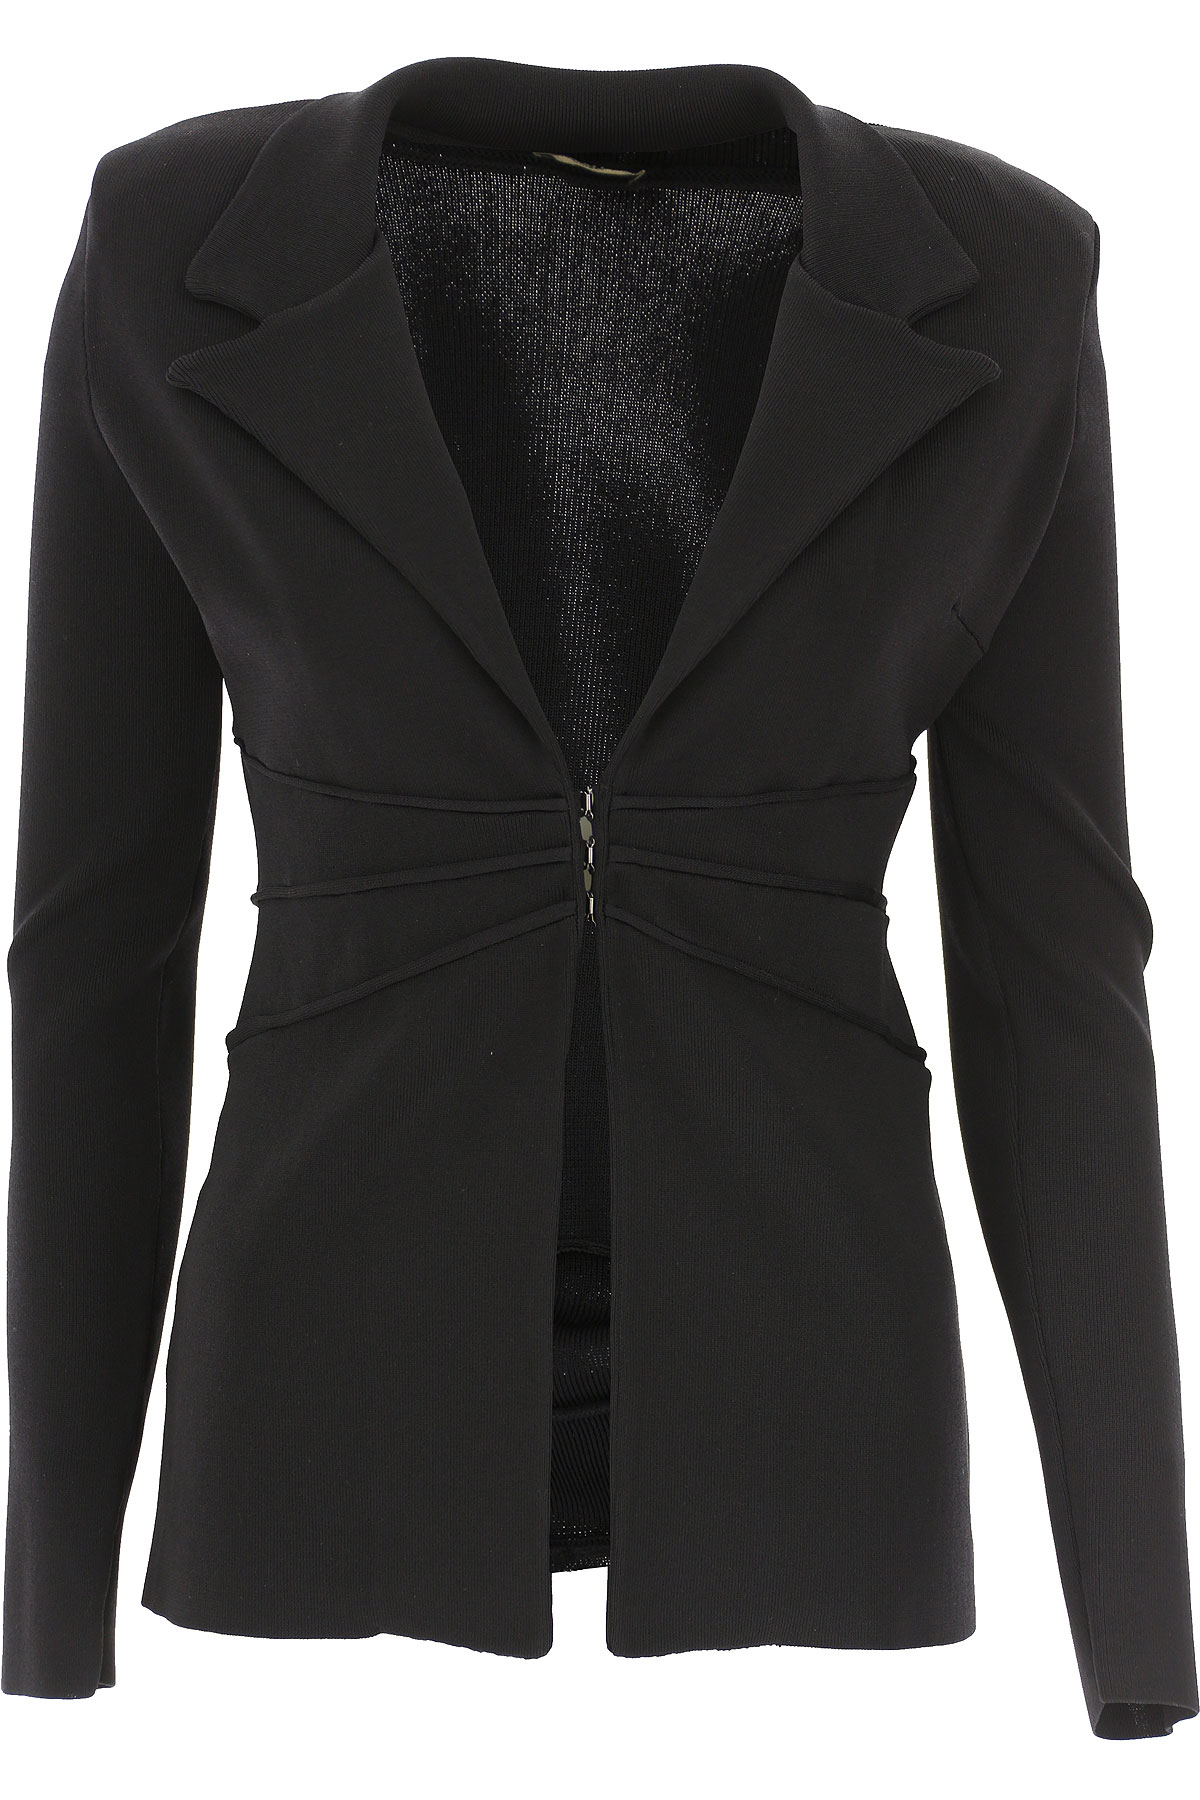 Pinko Blazer for Women On Sale, Black, Viscose, 2019, 4 6 8